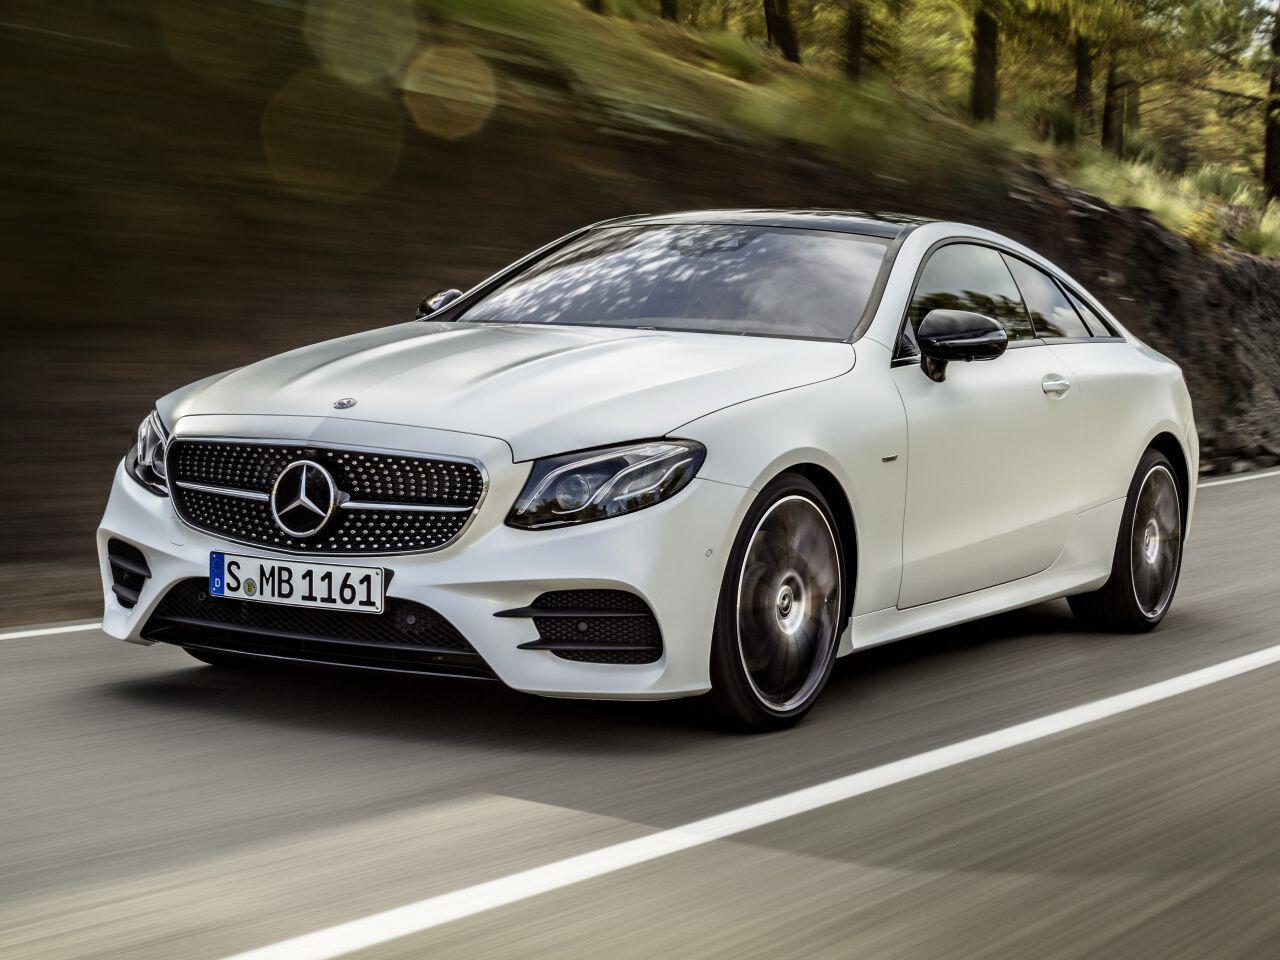 Bild zu 1. Platz Sportwagen: Mercedes E-Klasse Coupé